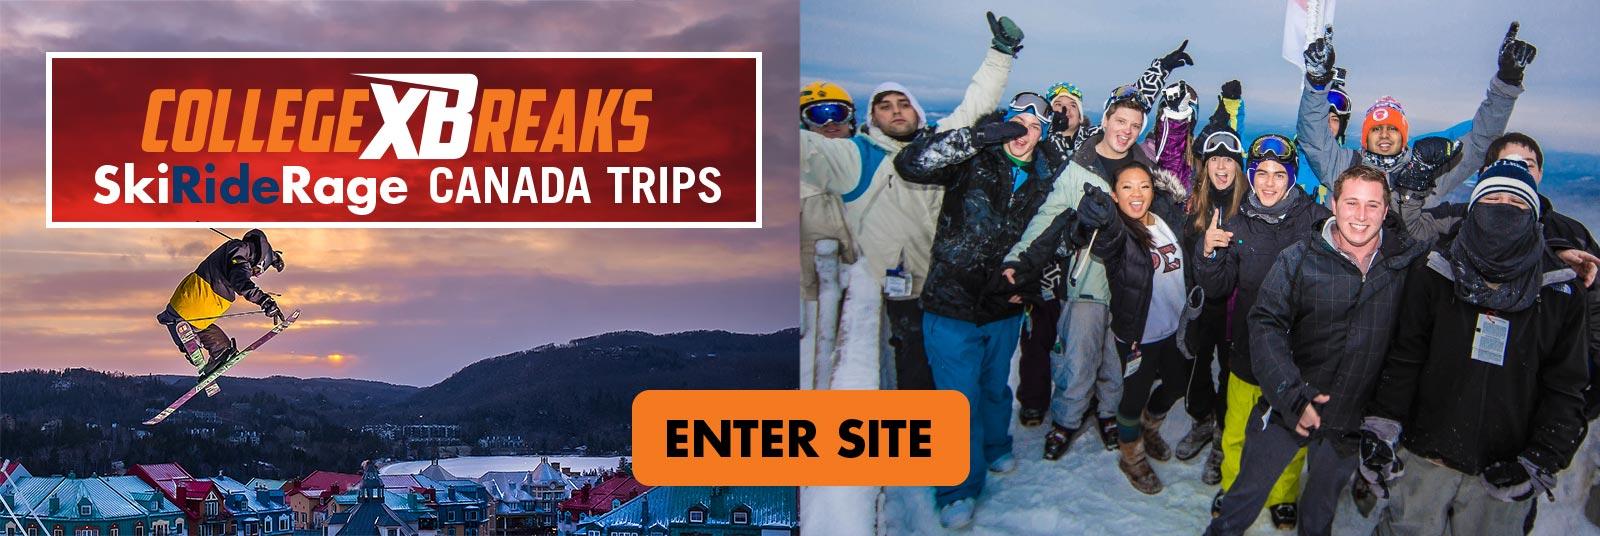 CollegeXBreaks ski trips